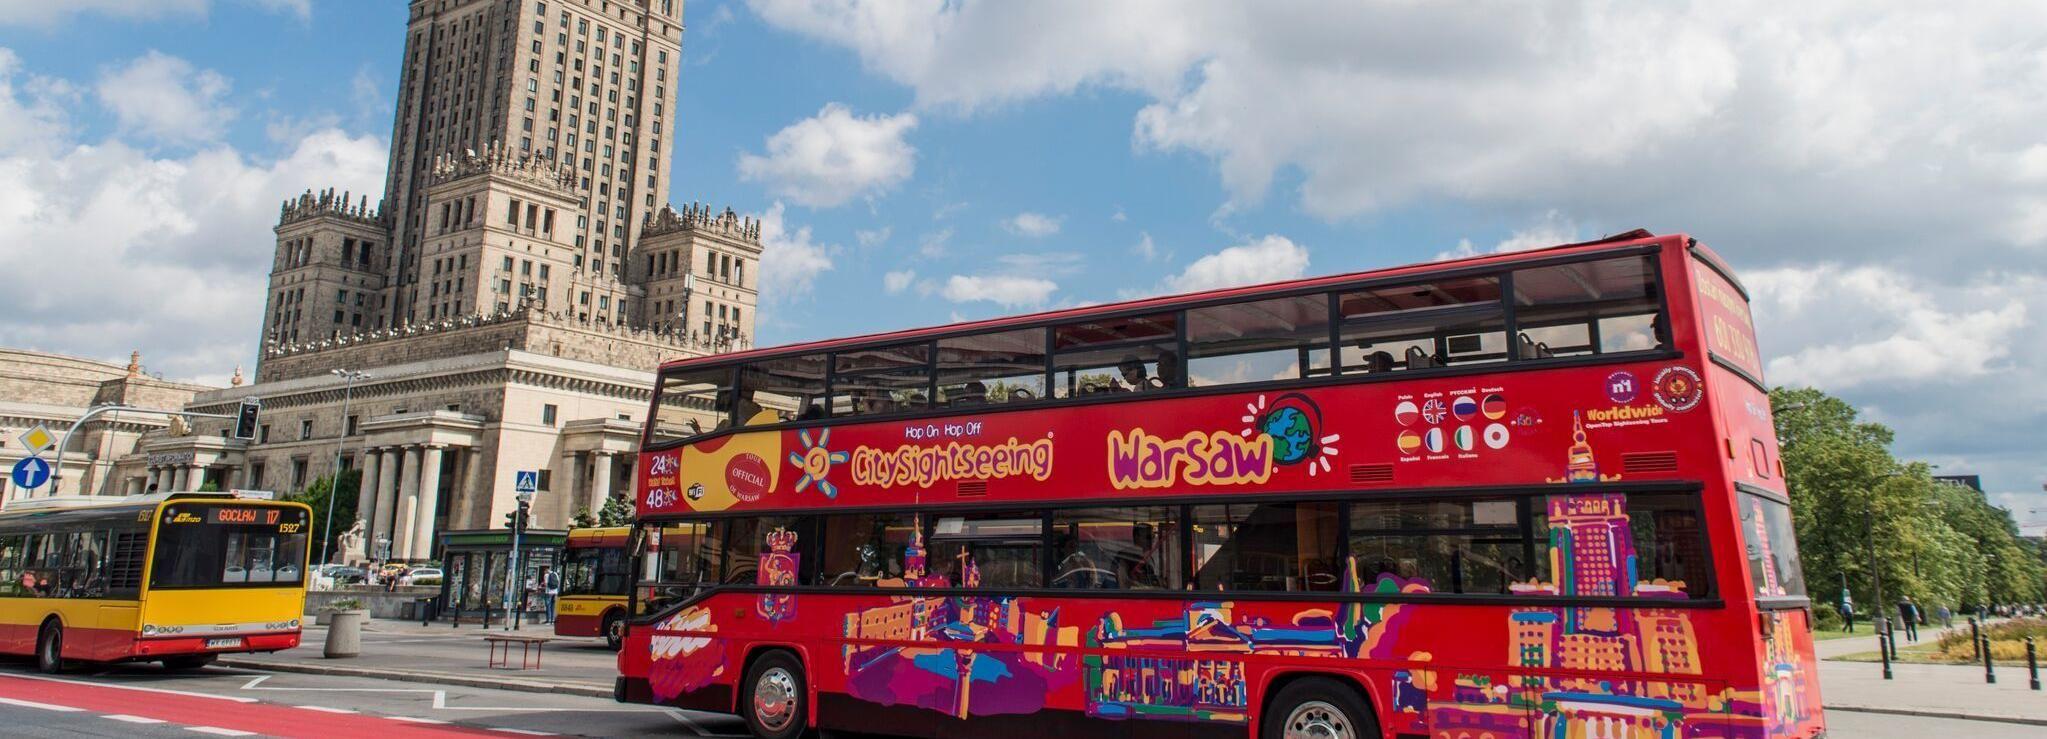 Warszawa: Hop-on-hop-off-busstur